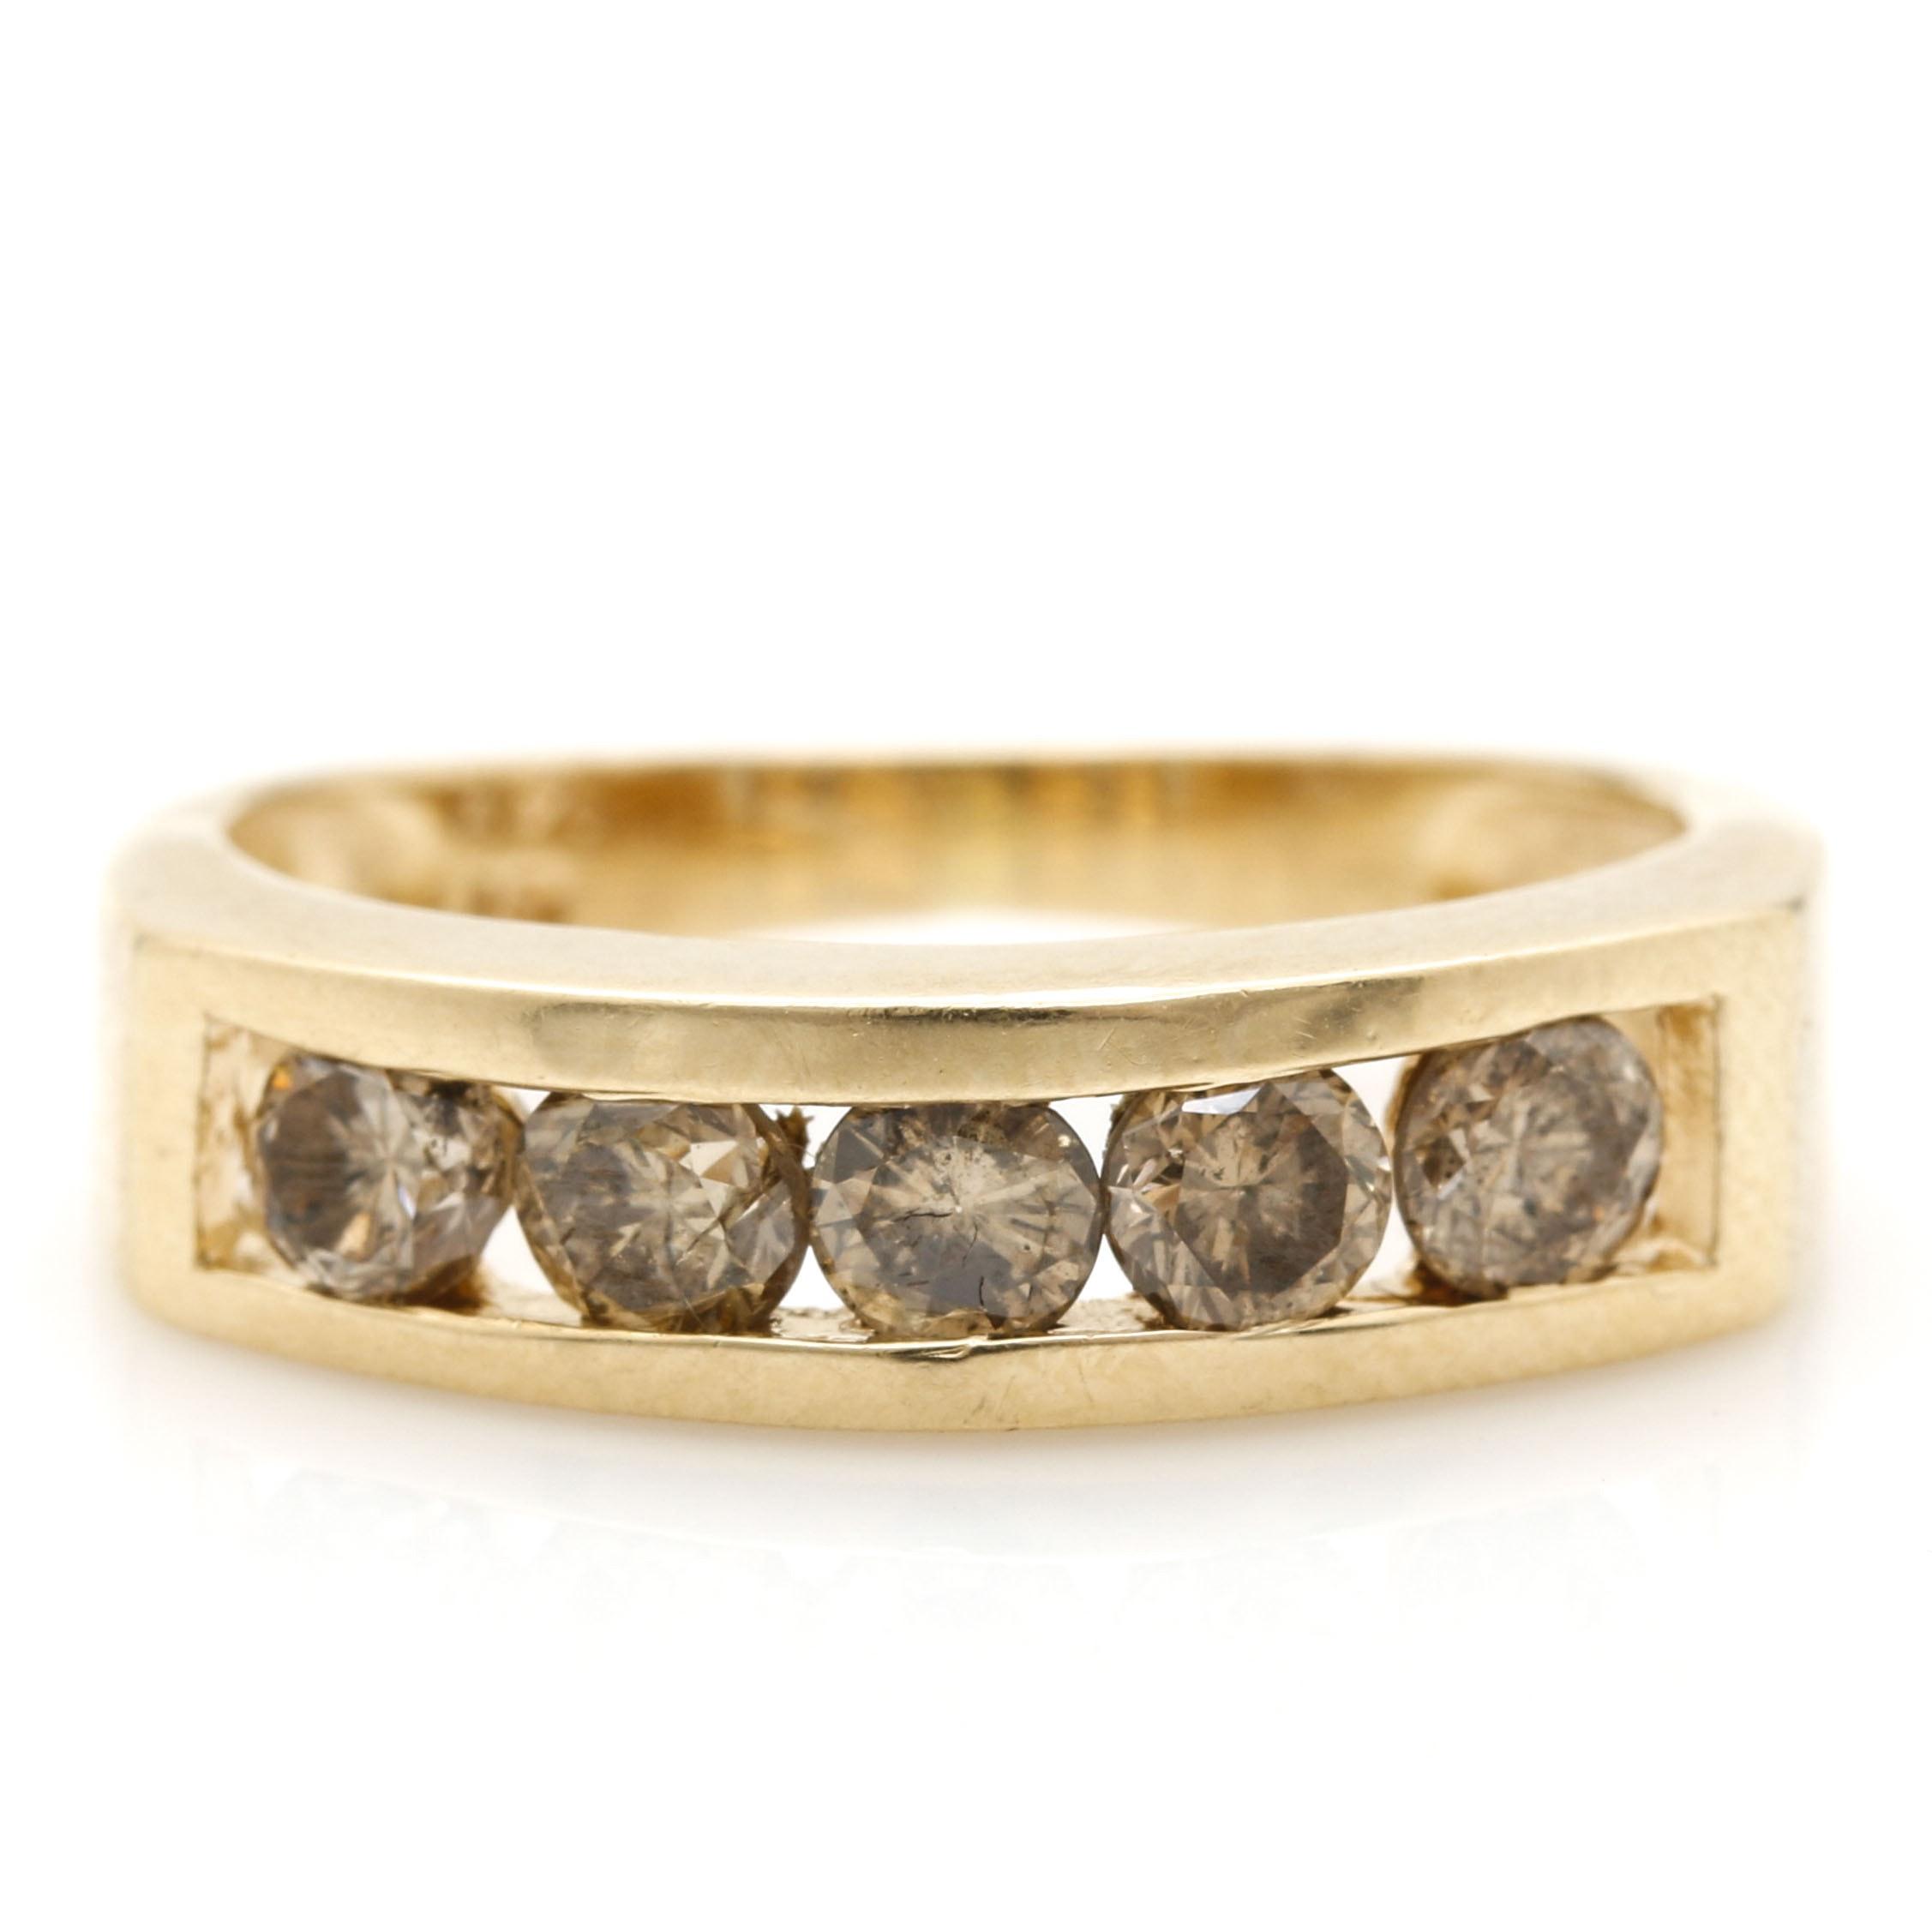 14K Yellow Gold Light Brown Diamond Ring